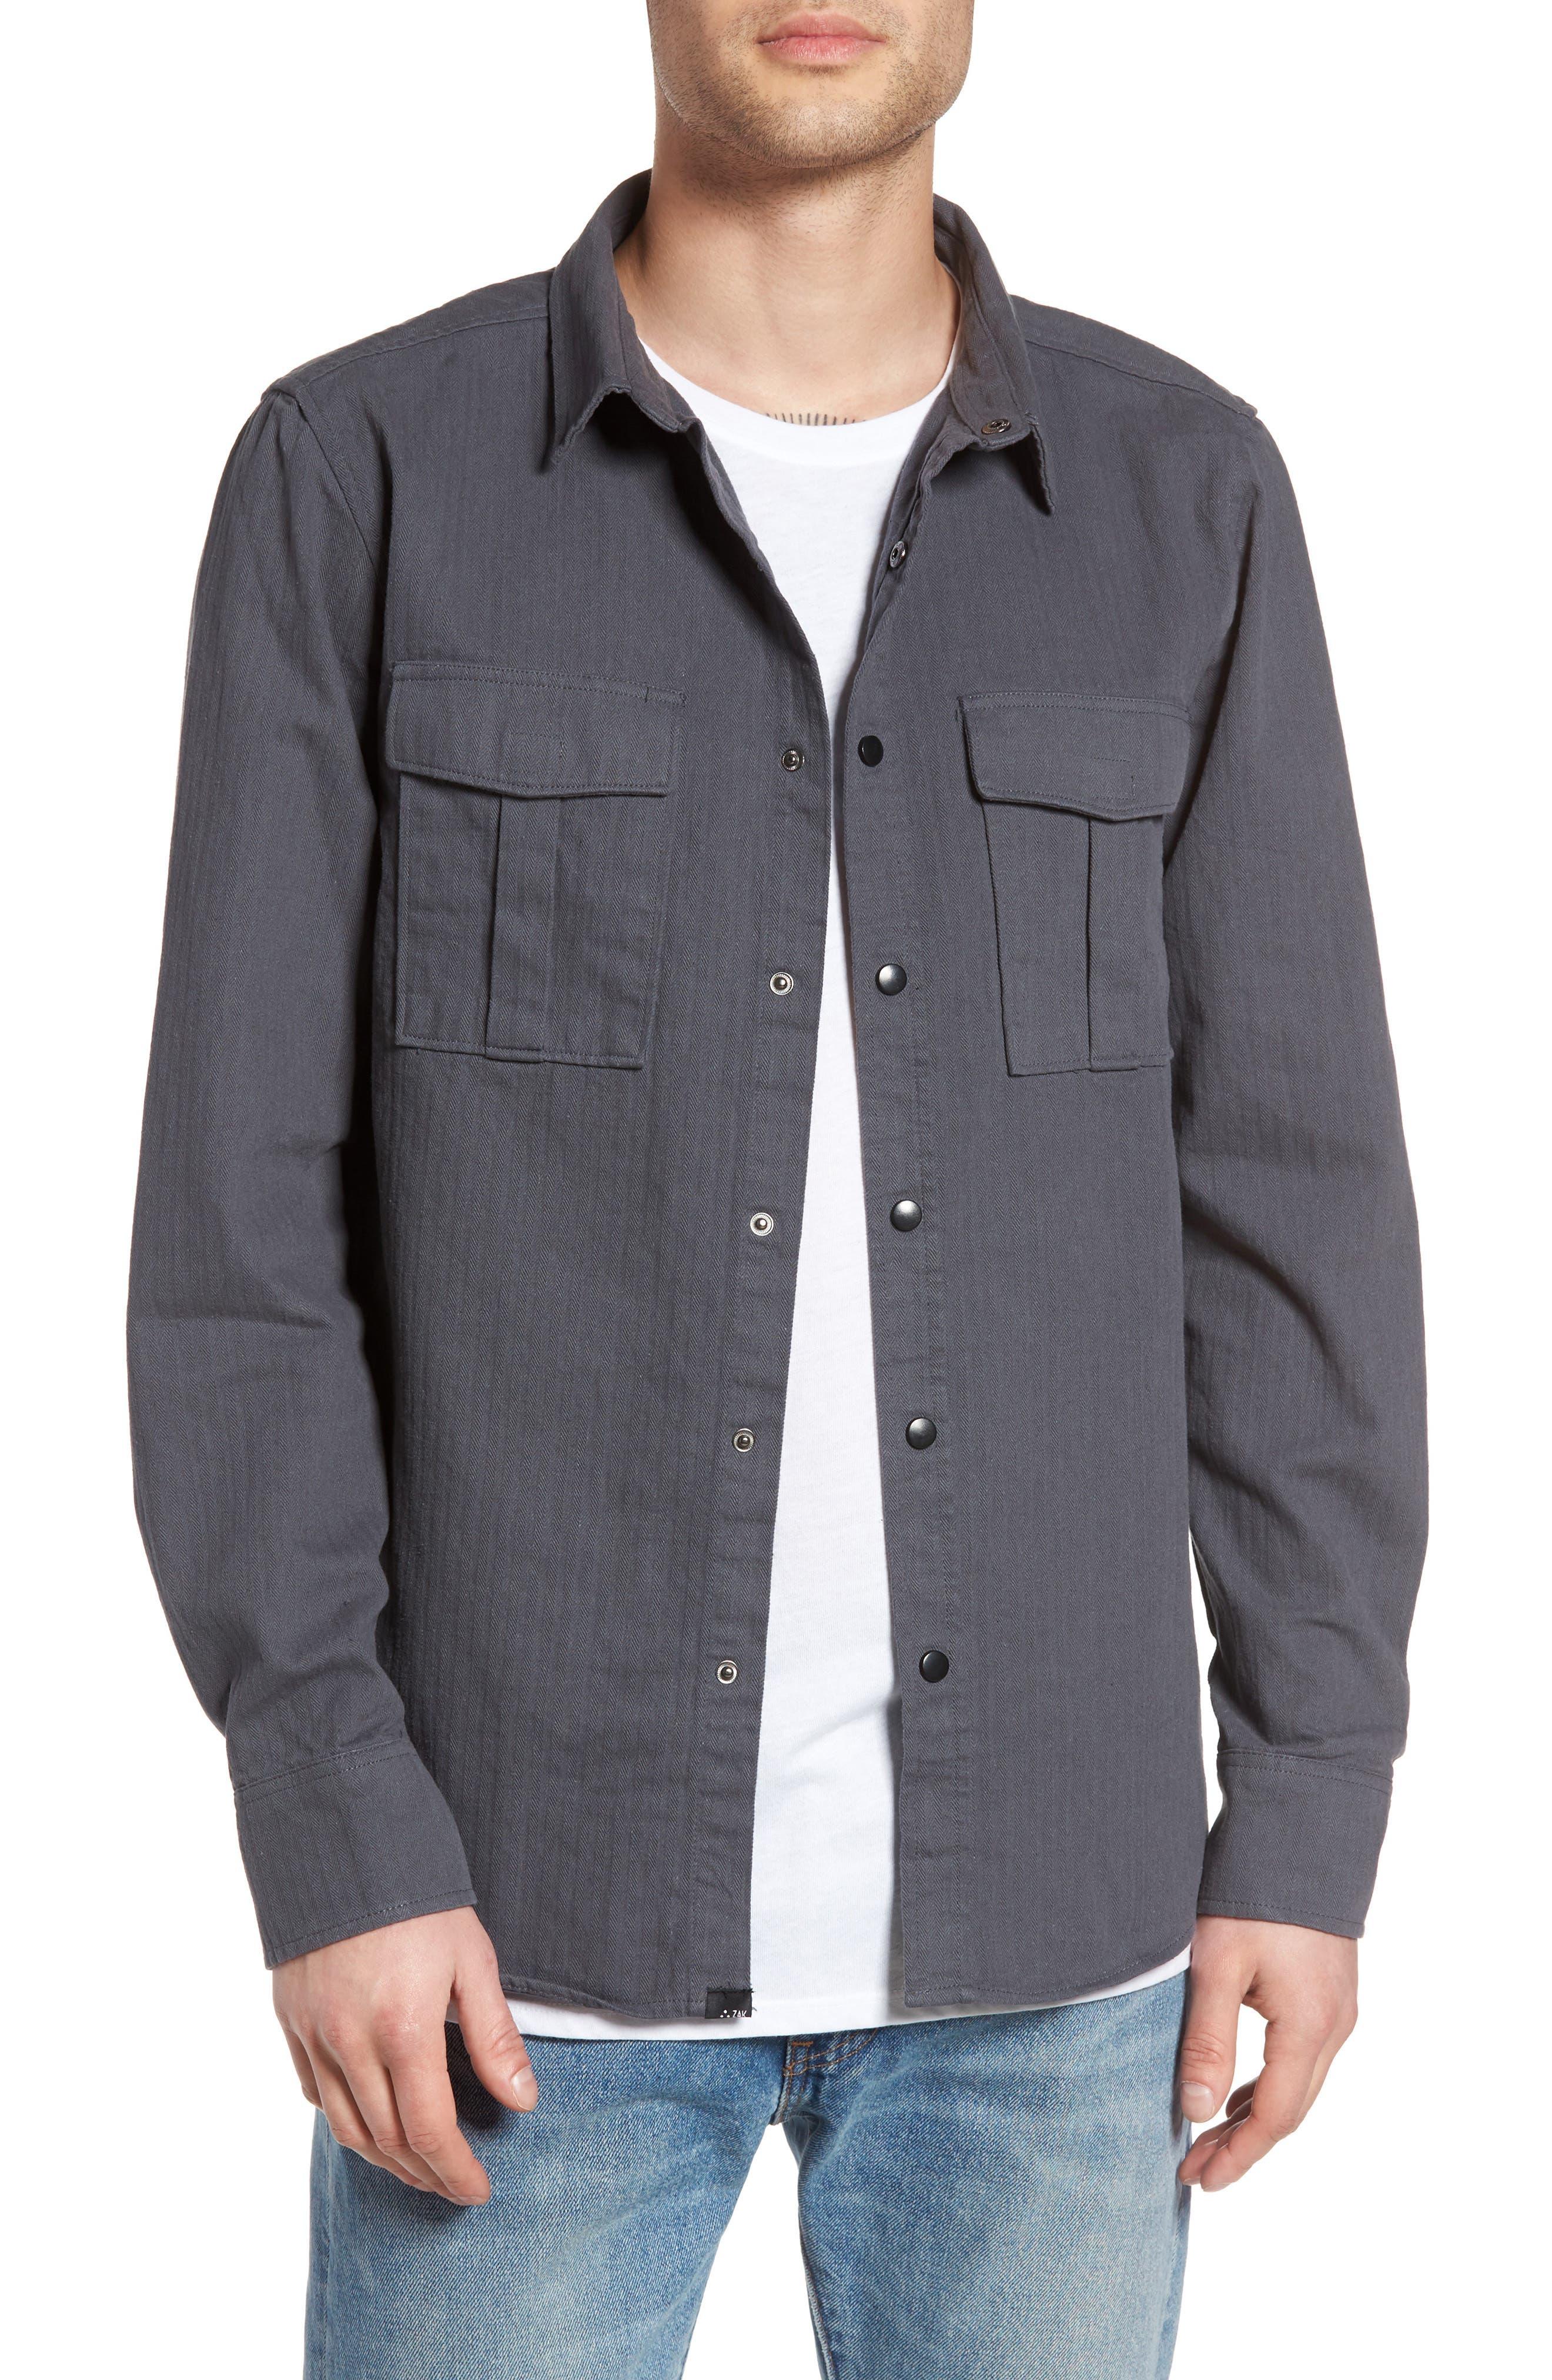 Z.A.K. Brand Euclid Herringbone Shirt Jacket